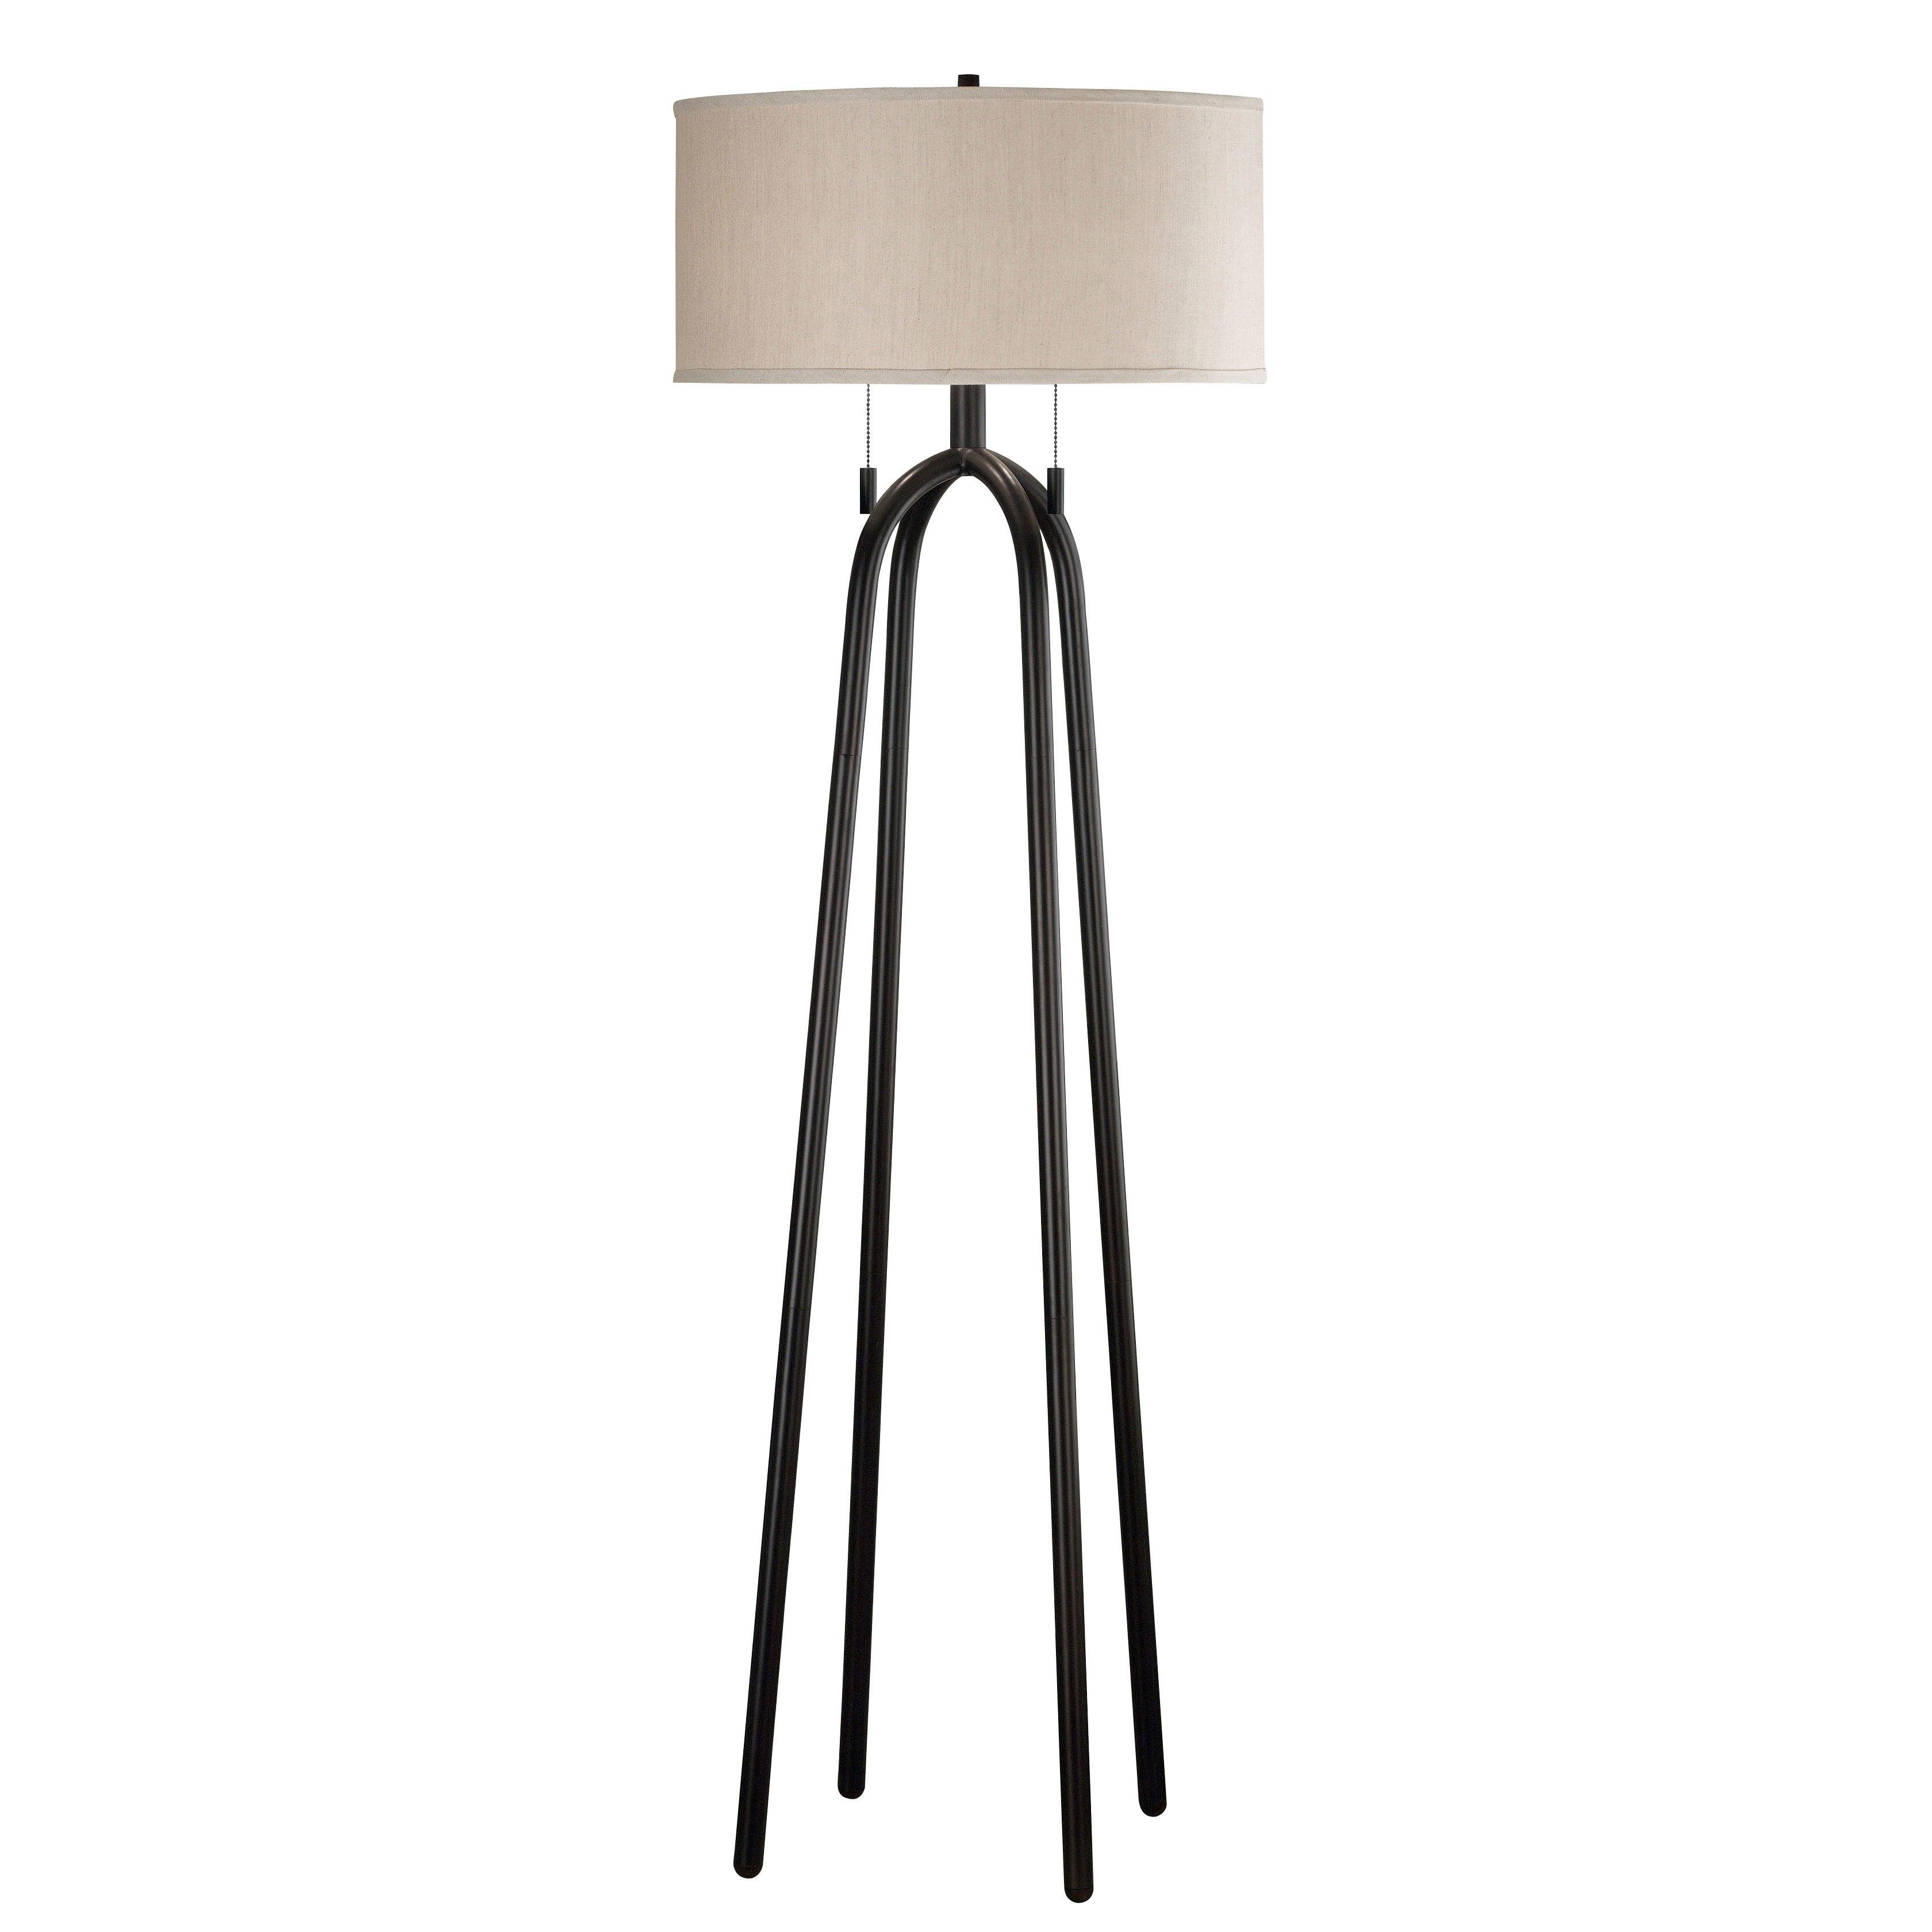 floor lamp overstock shopping great deals on design craft floor. Black Bedroom Furniture Sets. Home Design Ideas